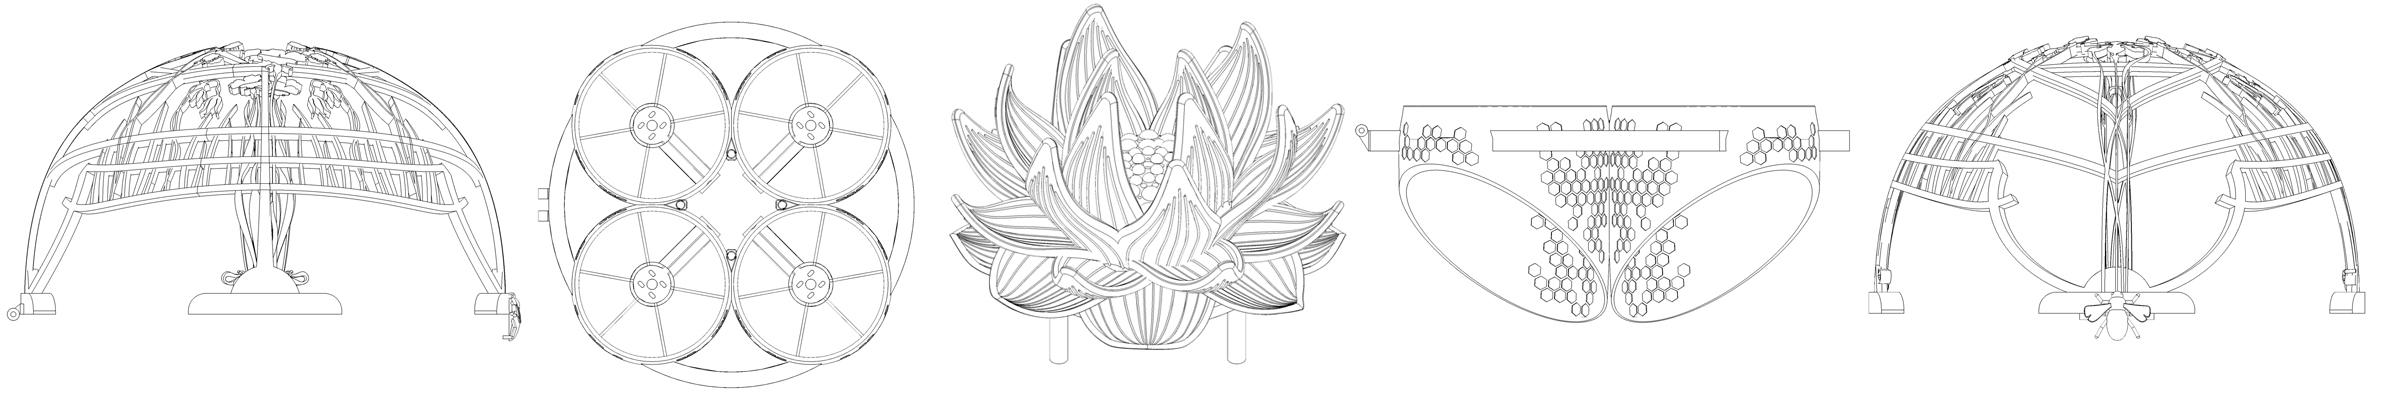 dronediagrams.jpg